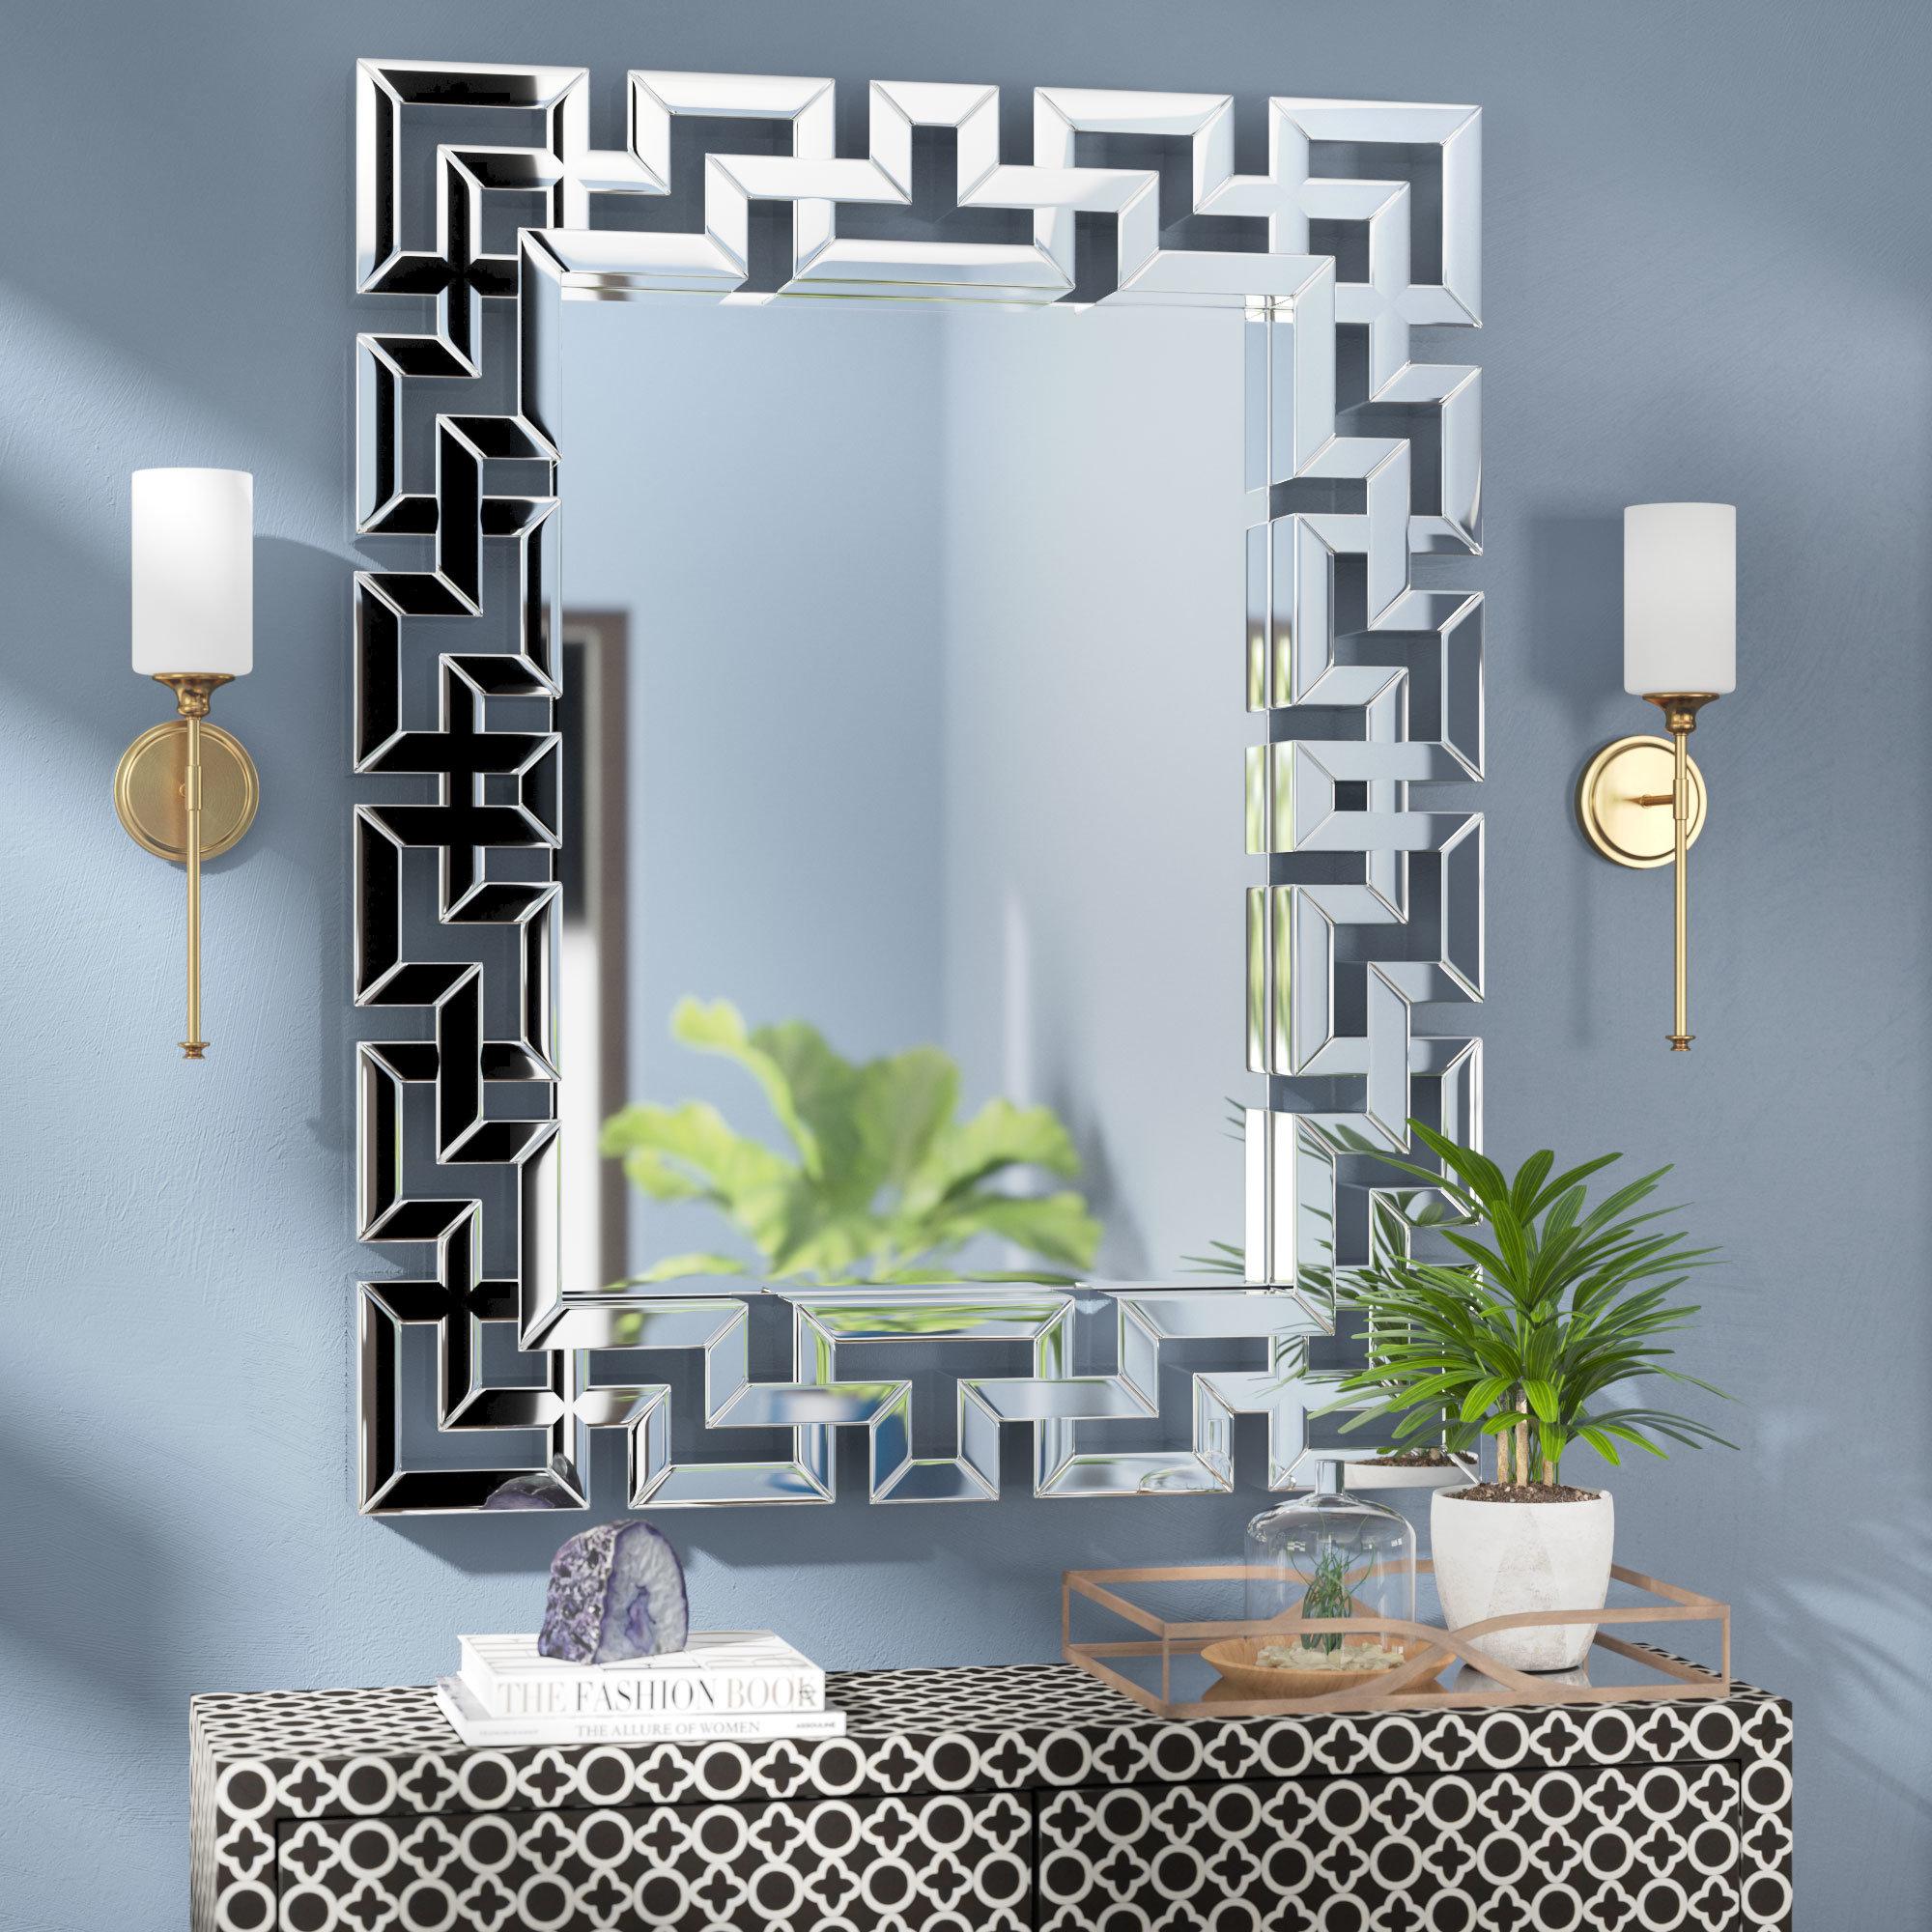 3X5 Mirror | Wayfair inside Pennsburg Rectangle Wall Mirrors (Image 1 of 30)